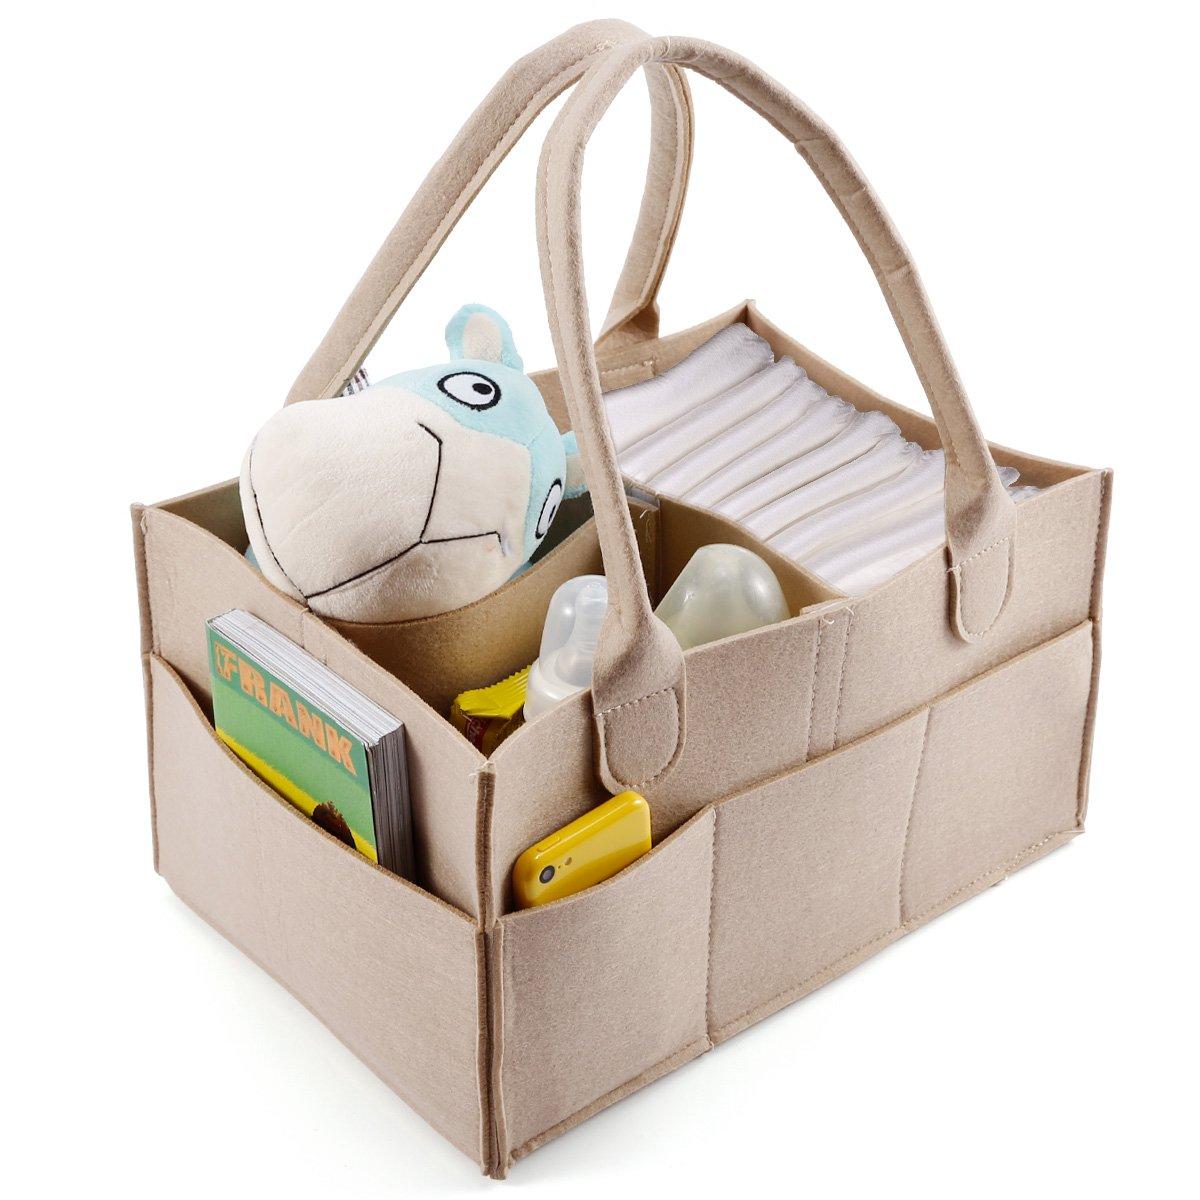 Anladia 3 Compartments Baby Diaper Caddy Nursery Storage Bin Infant Wipes Bag Nappy Organizer Basket